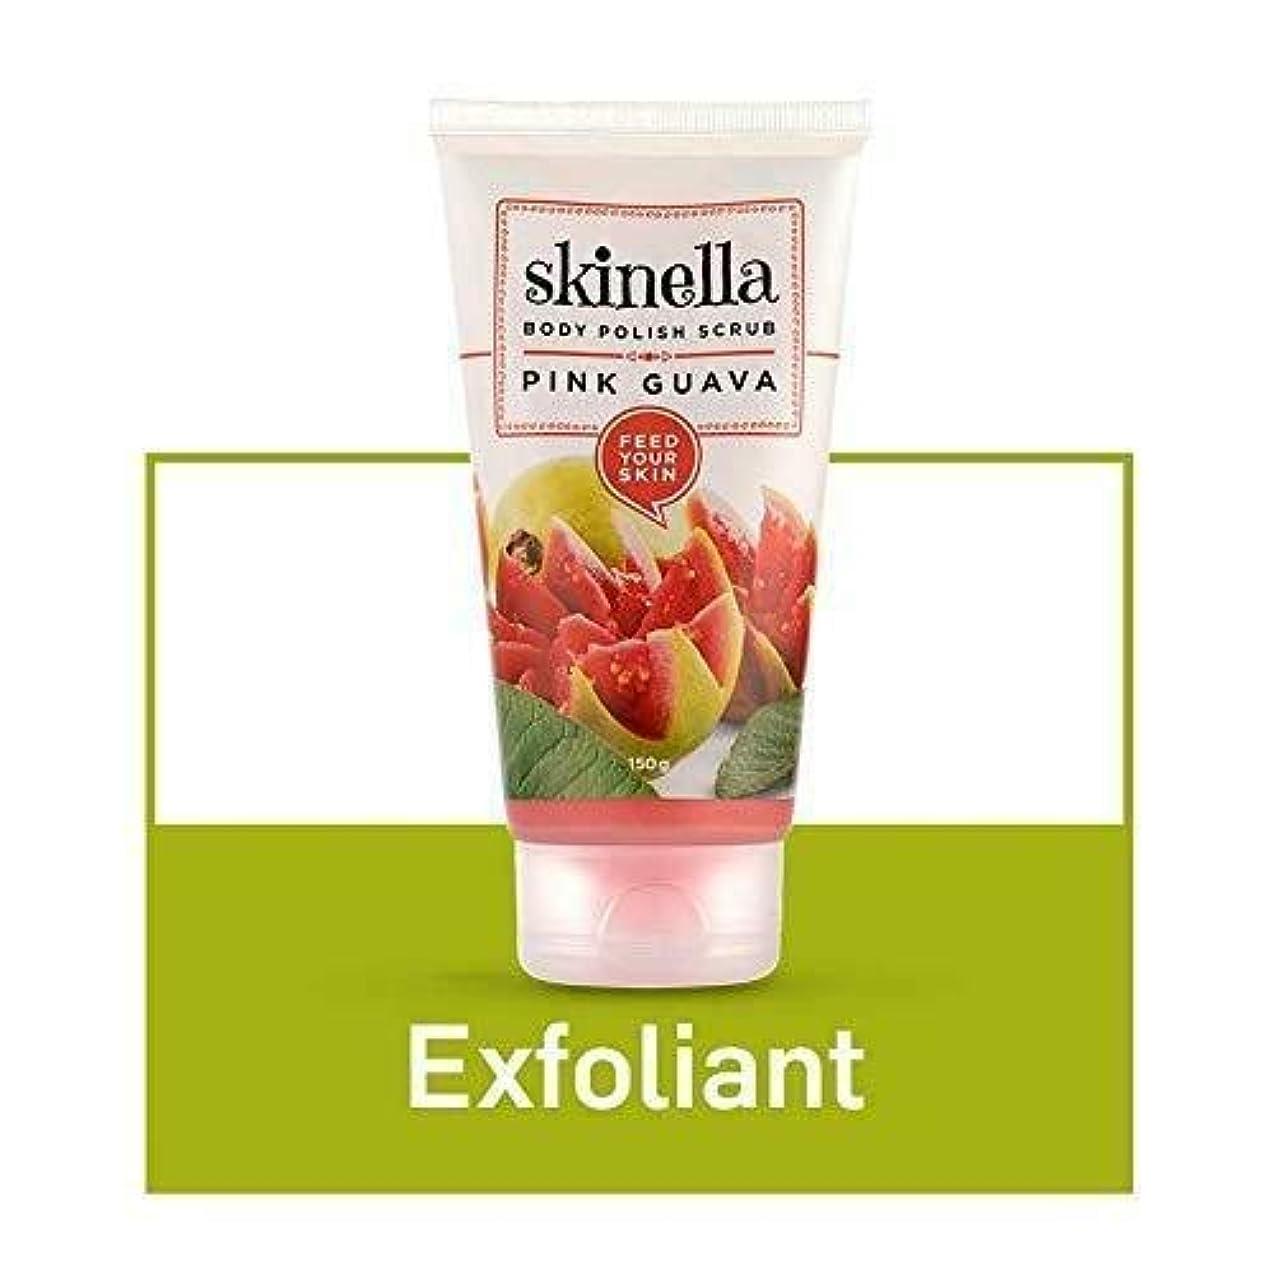 Skinella Body Polish Scrub Pink Guava 150g Softens skin & Instantly exfoliates